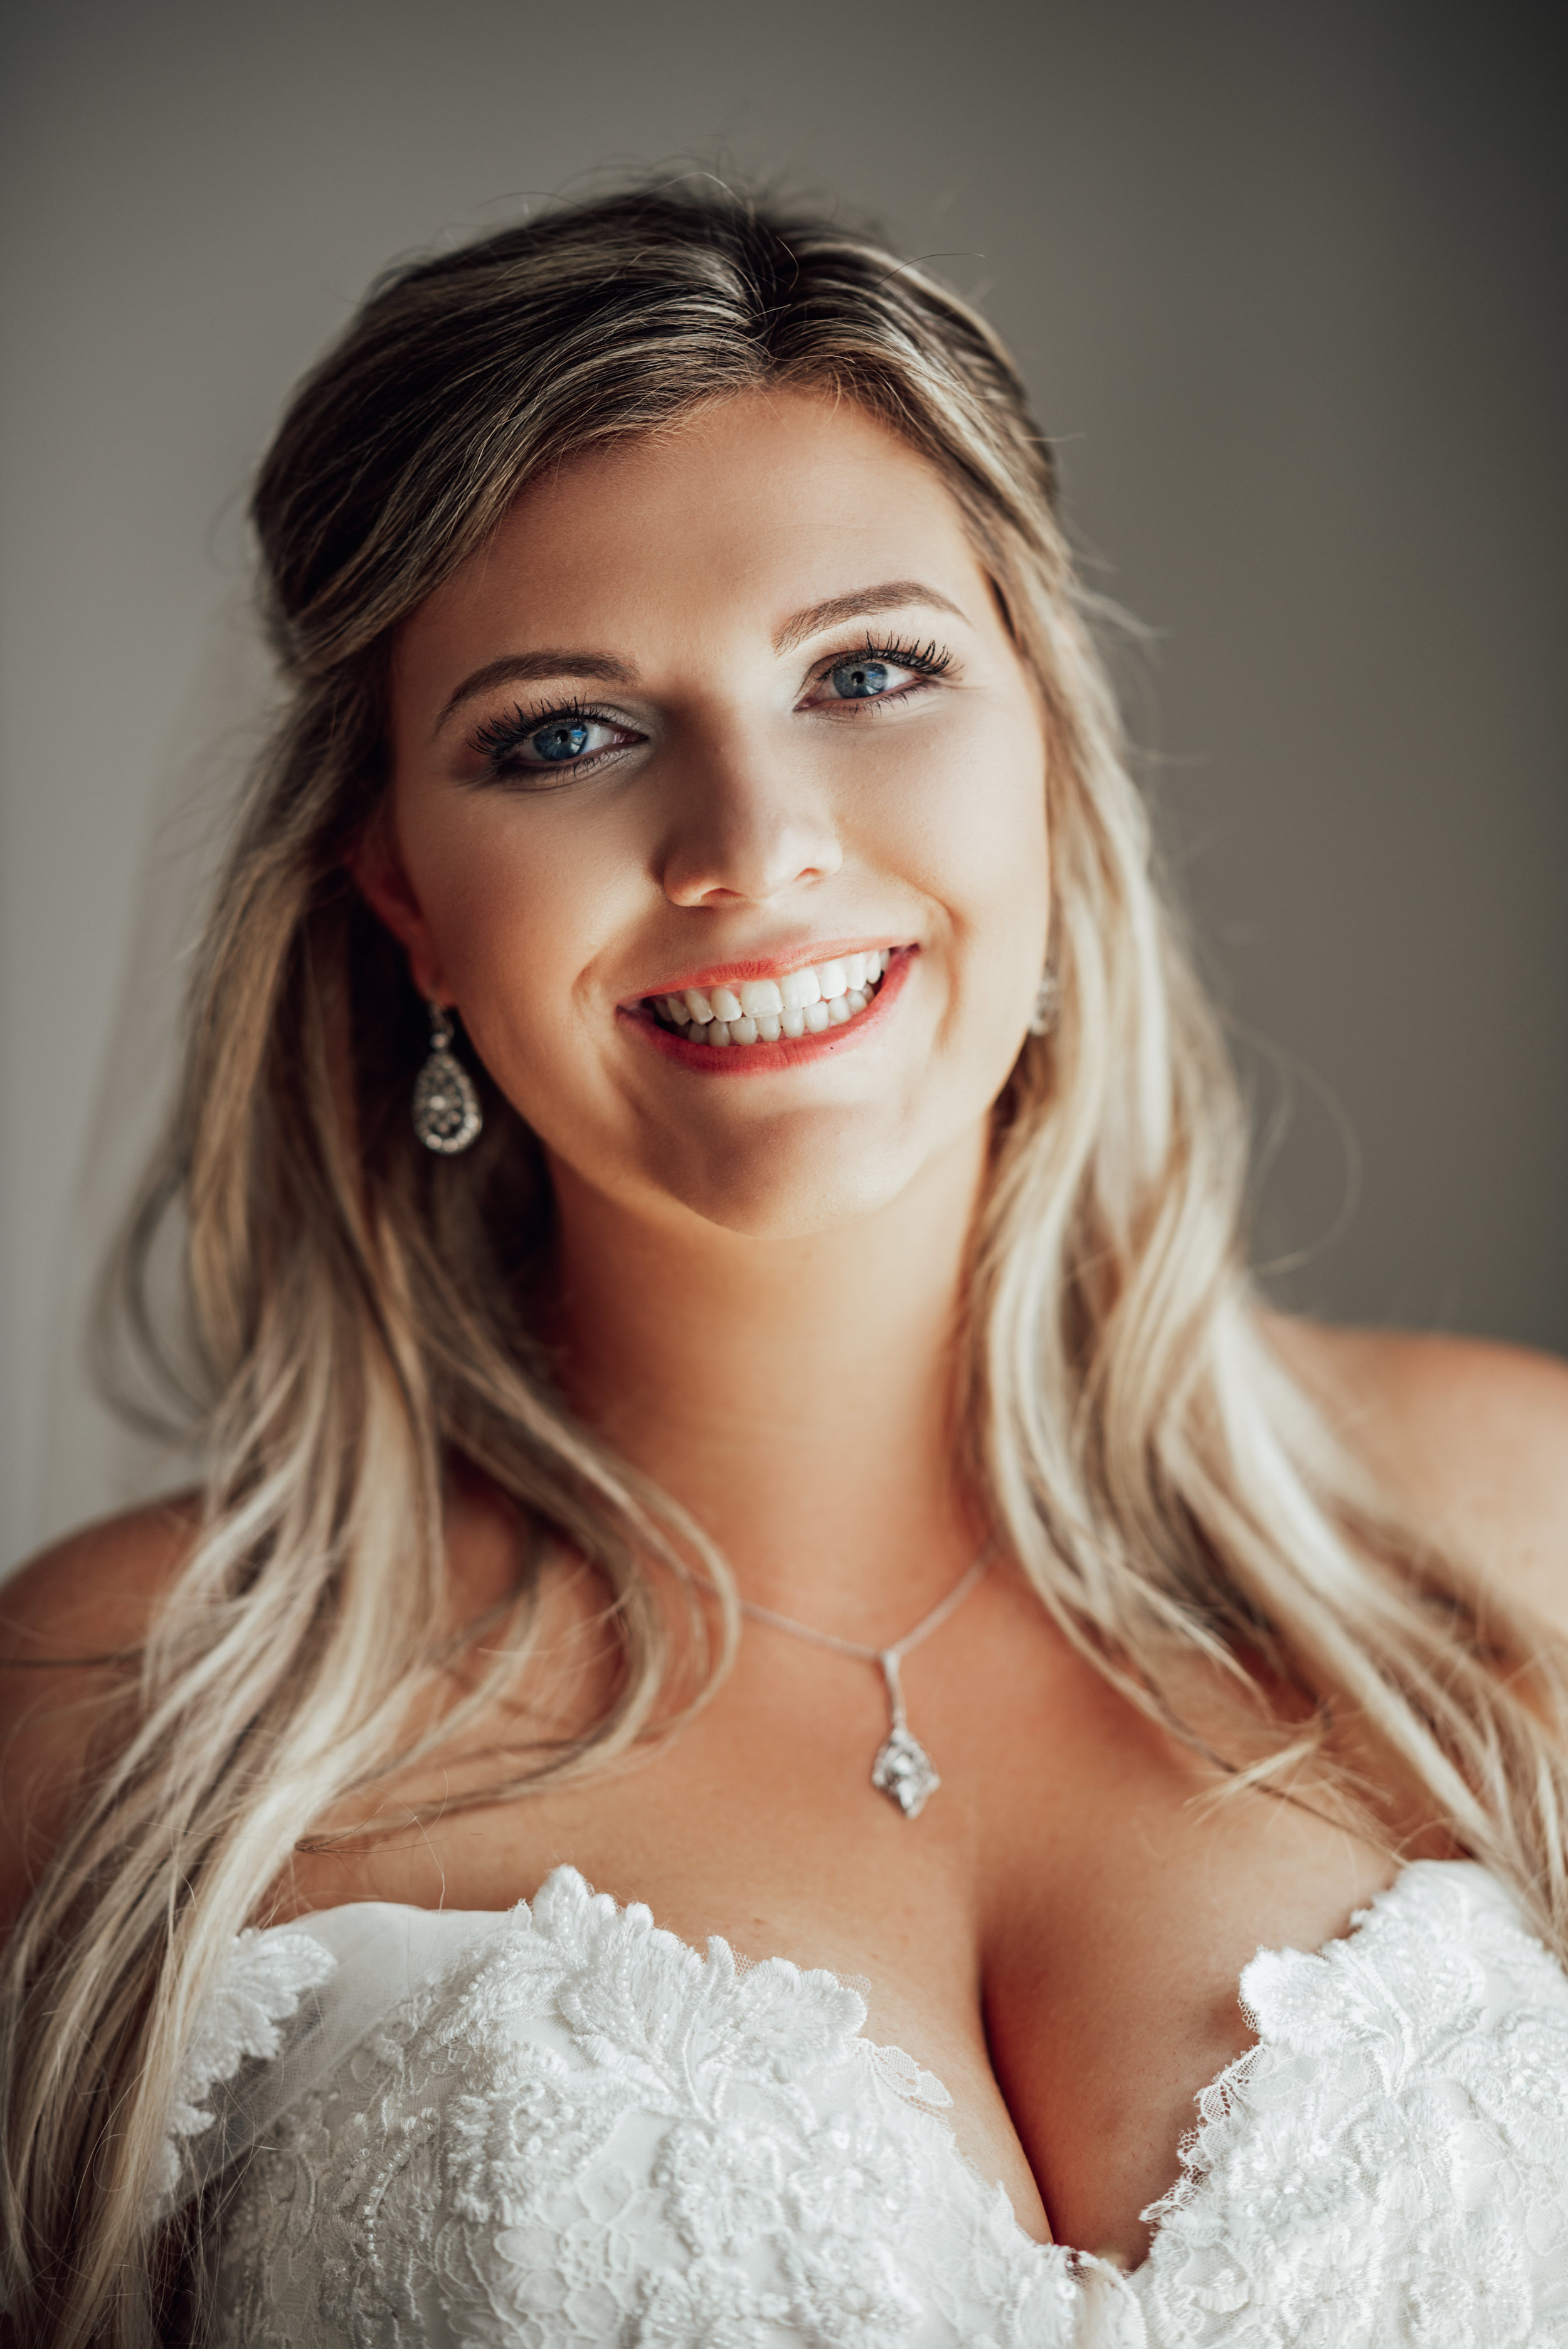 New Jersey Wedding Photographer, Felsberg Photography LBI wedding photography 41.jpg